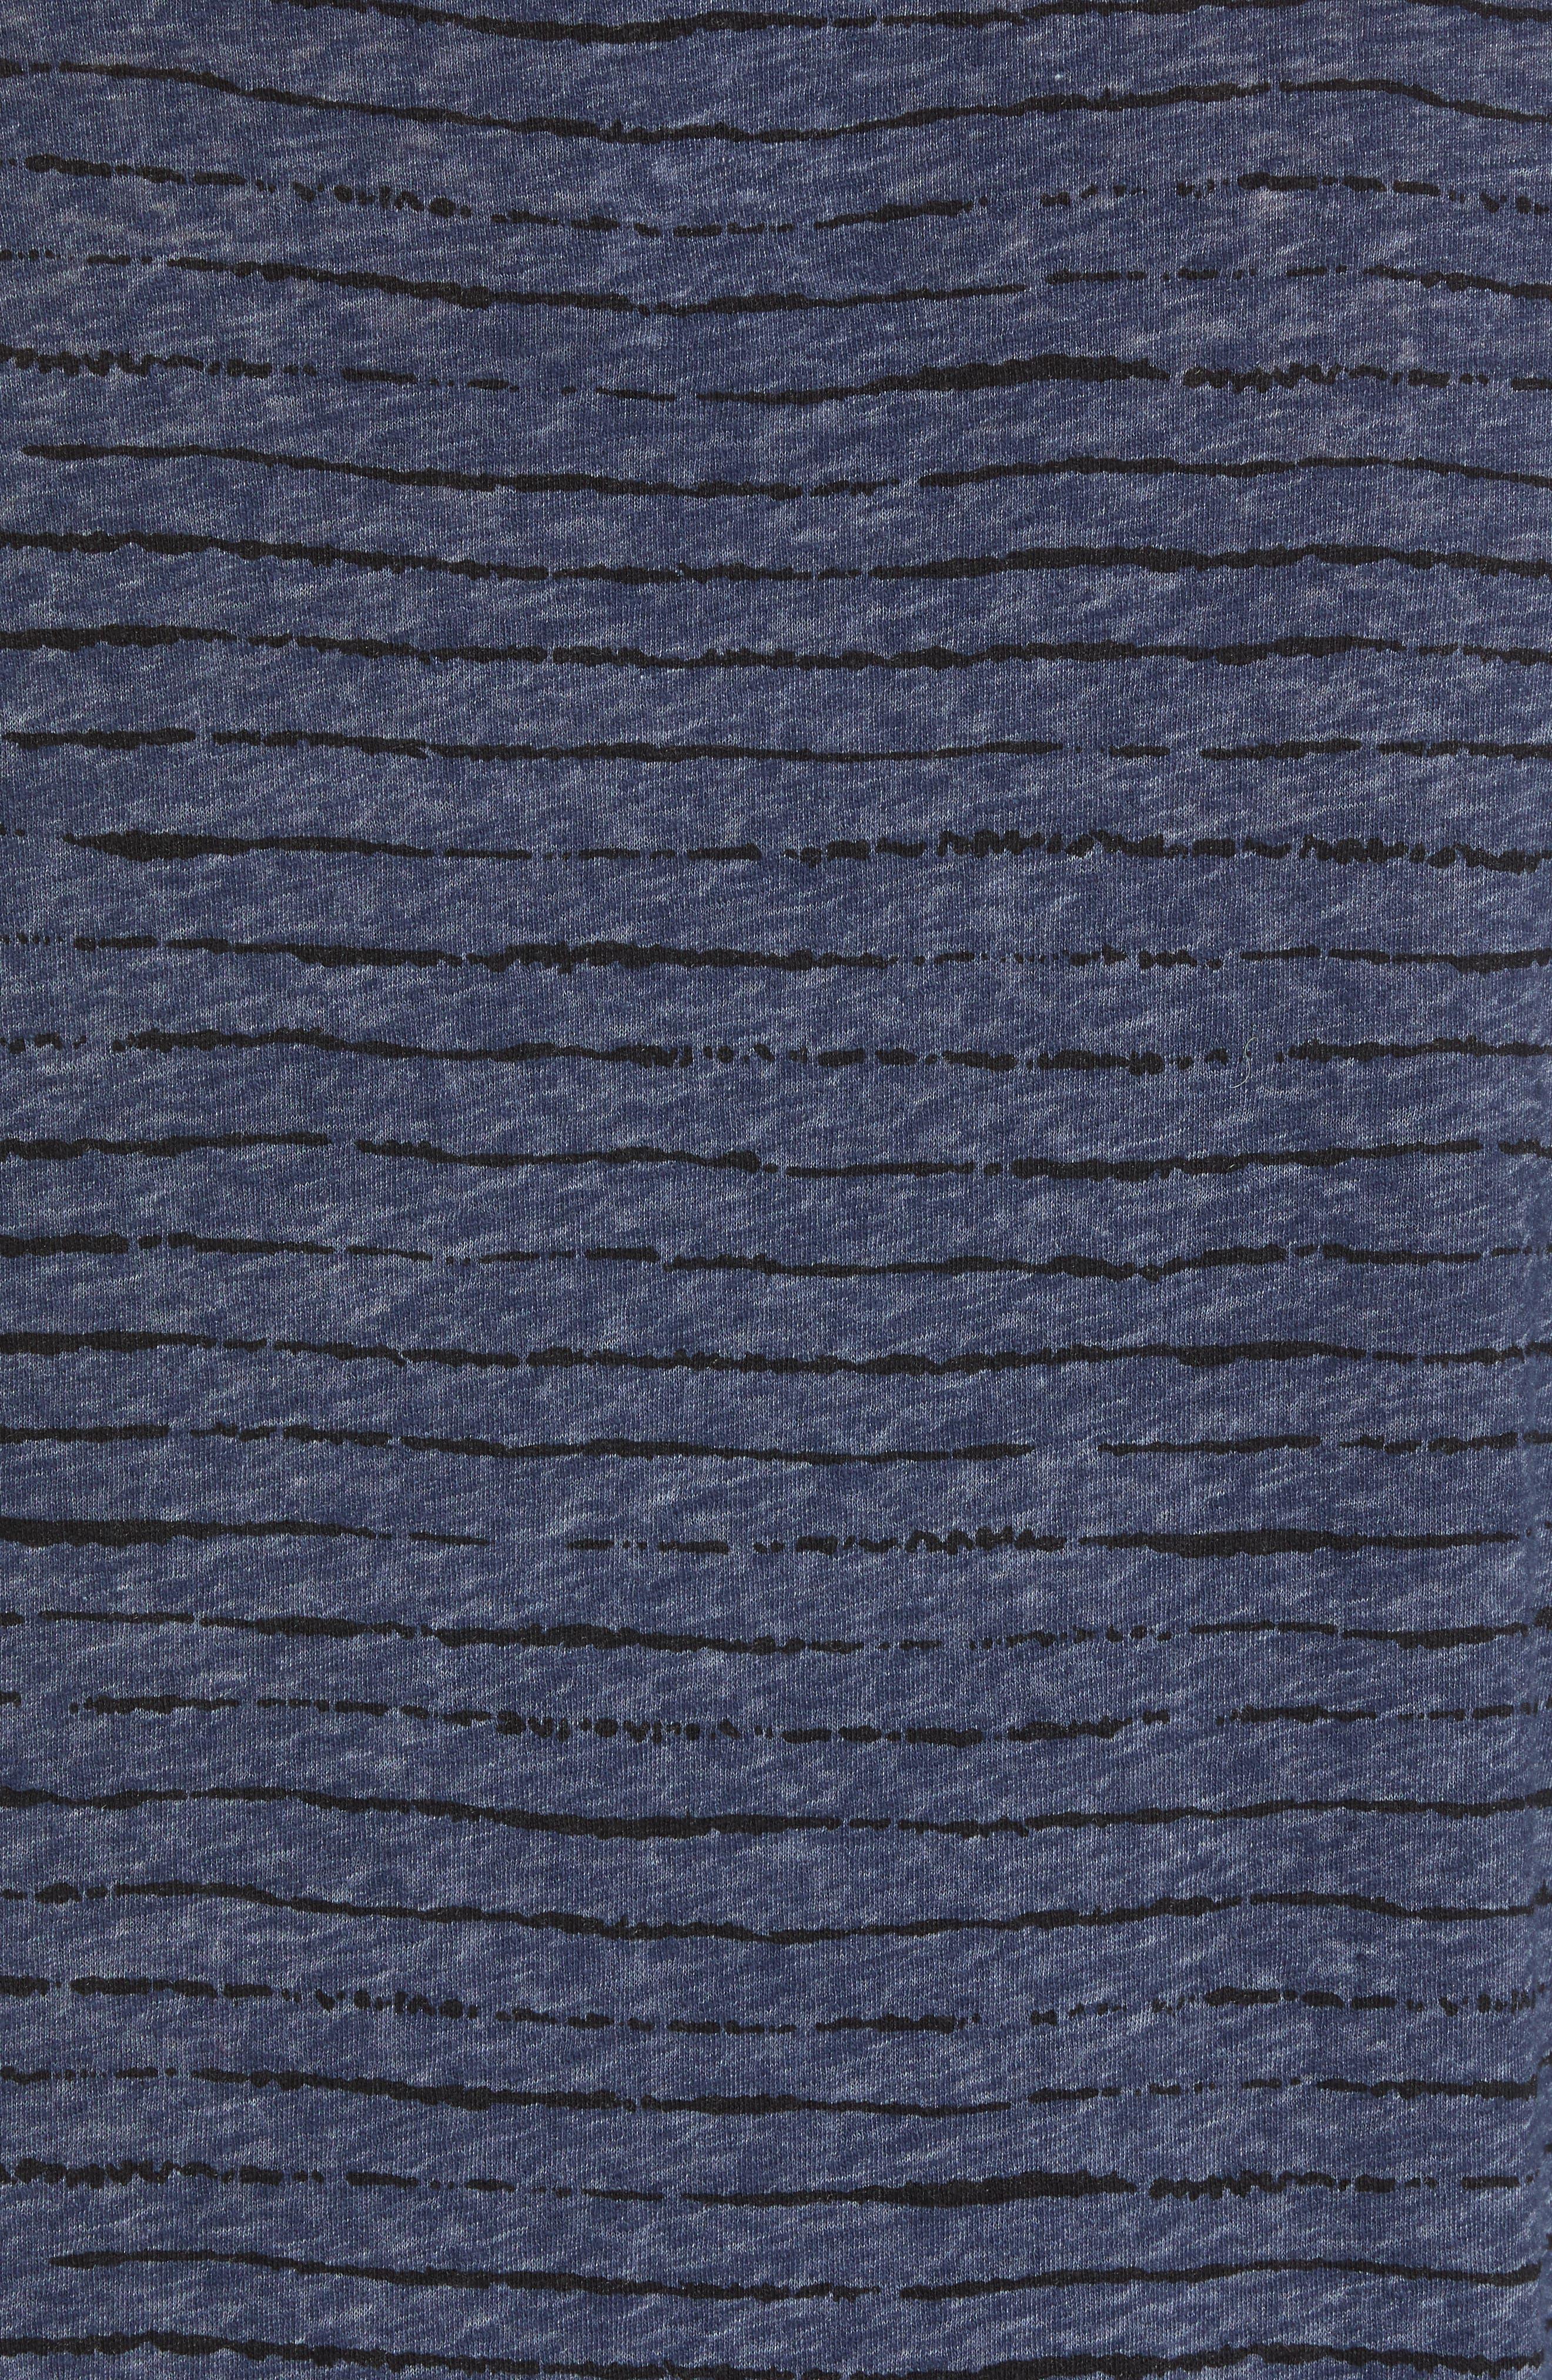 Regular Fit Crewneck Shirt,                             Alternate thumbnail 5, color,                             MIDNIGHT